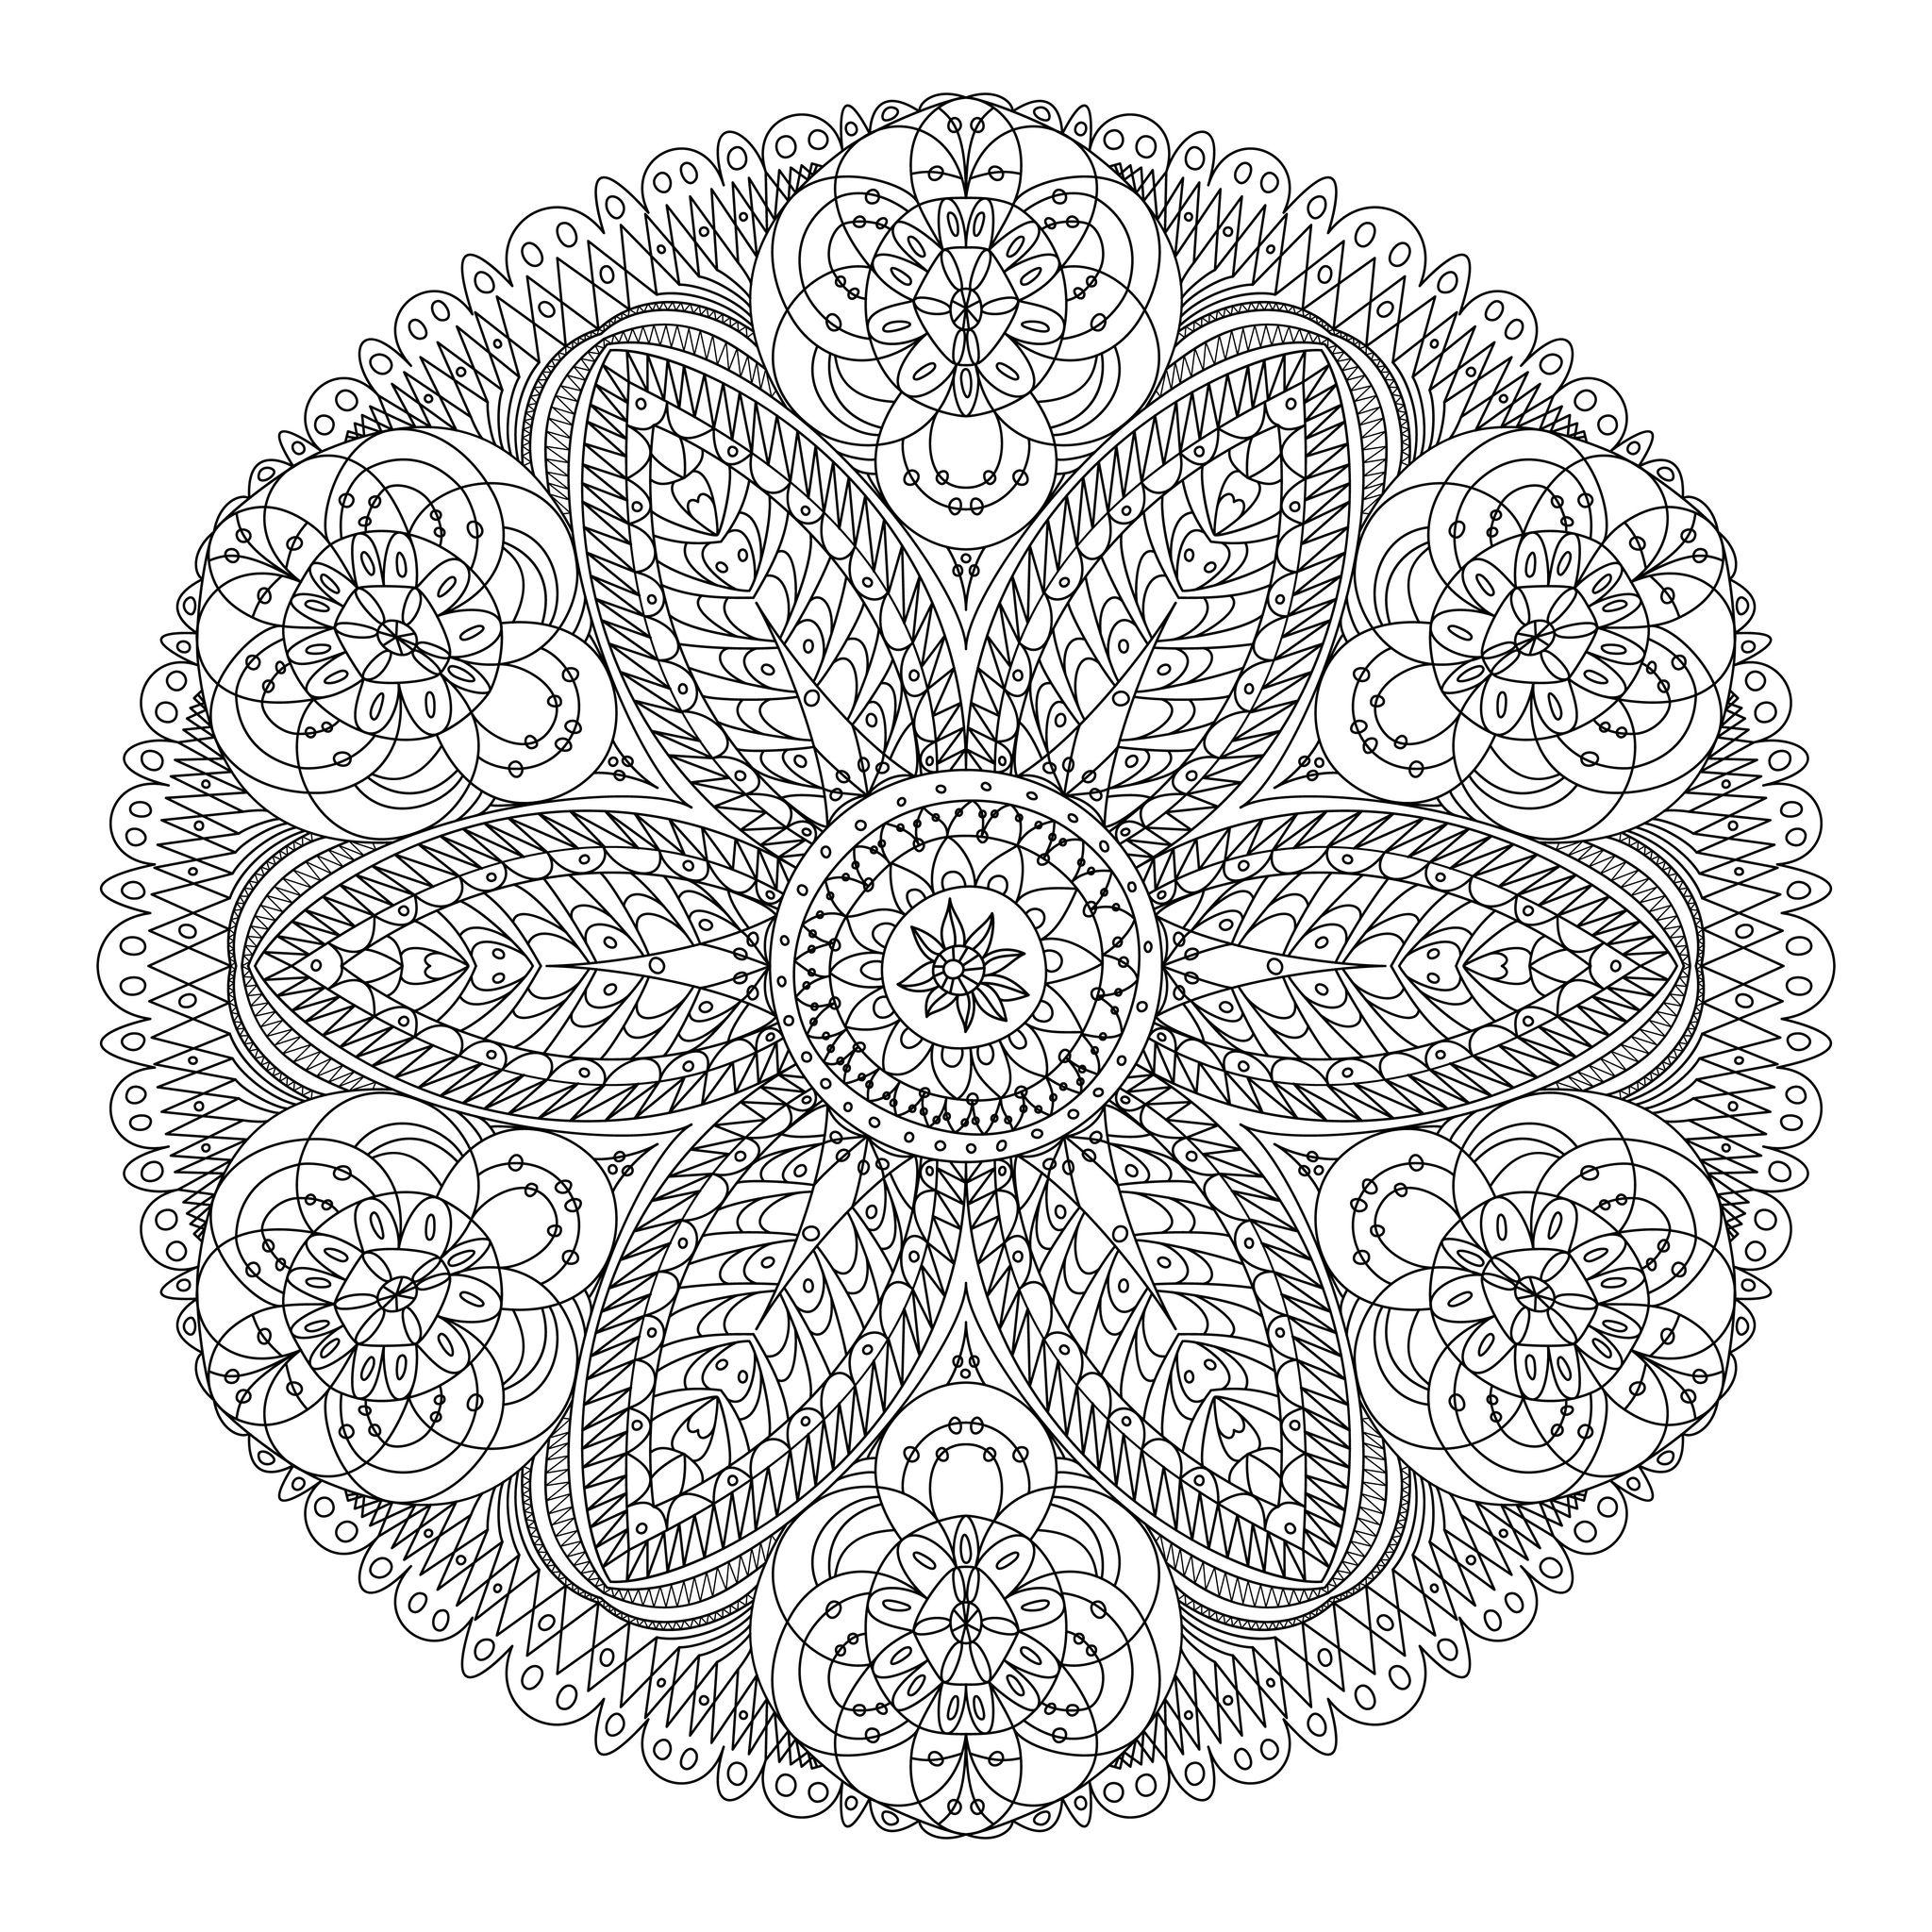 Coloriage Adulte - Mandala tout Mandala À Imprimer Facile